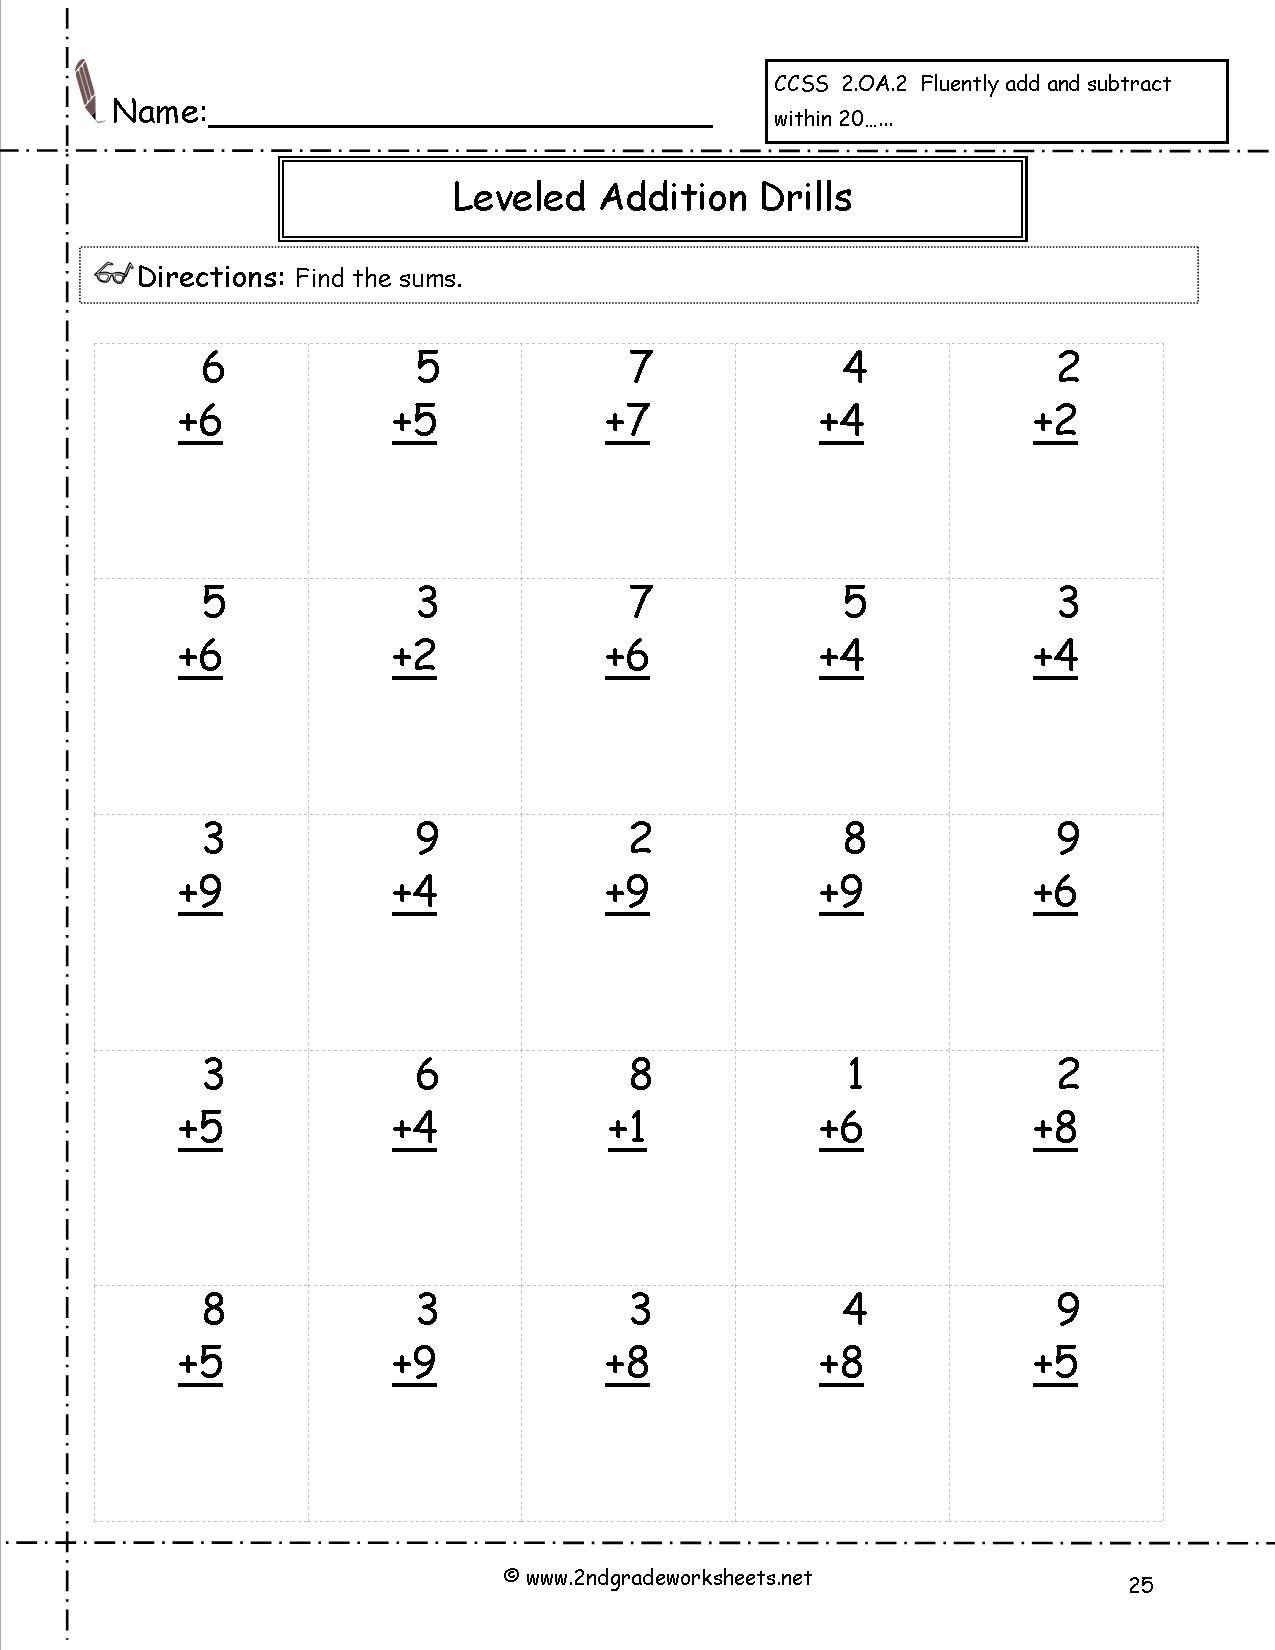 Free Math Worksheets And Printouts | Year 2 Maths Worksheets Free Printable